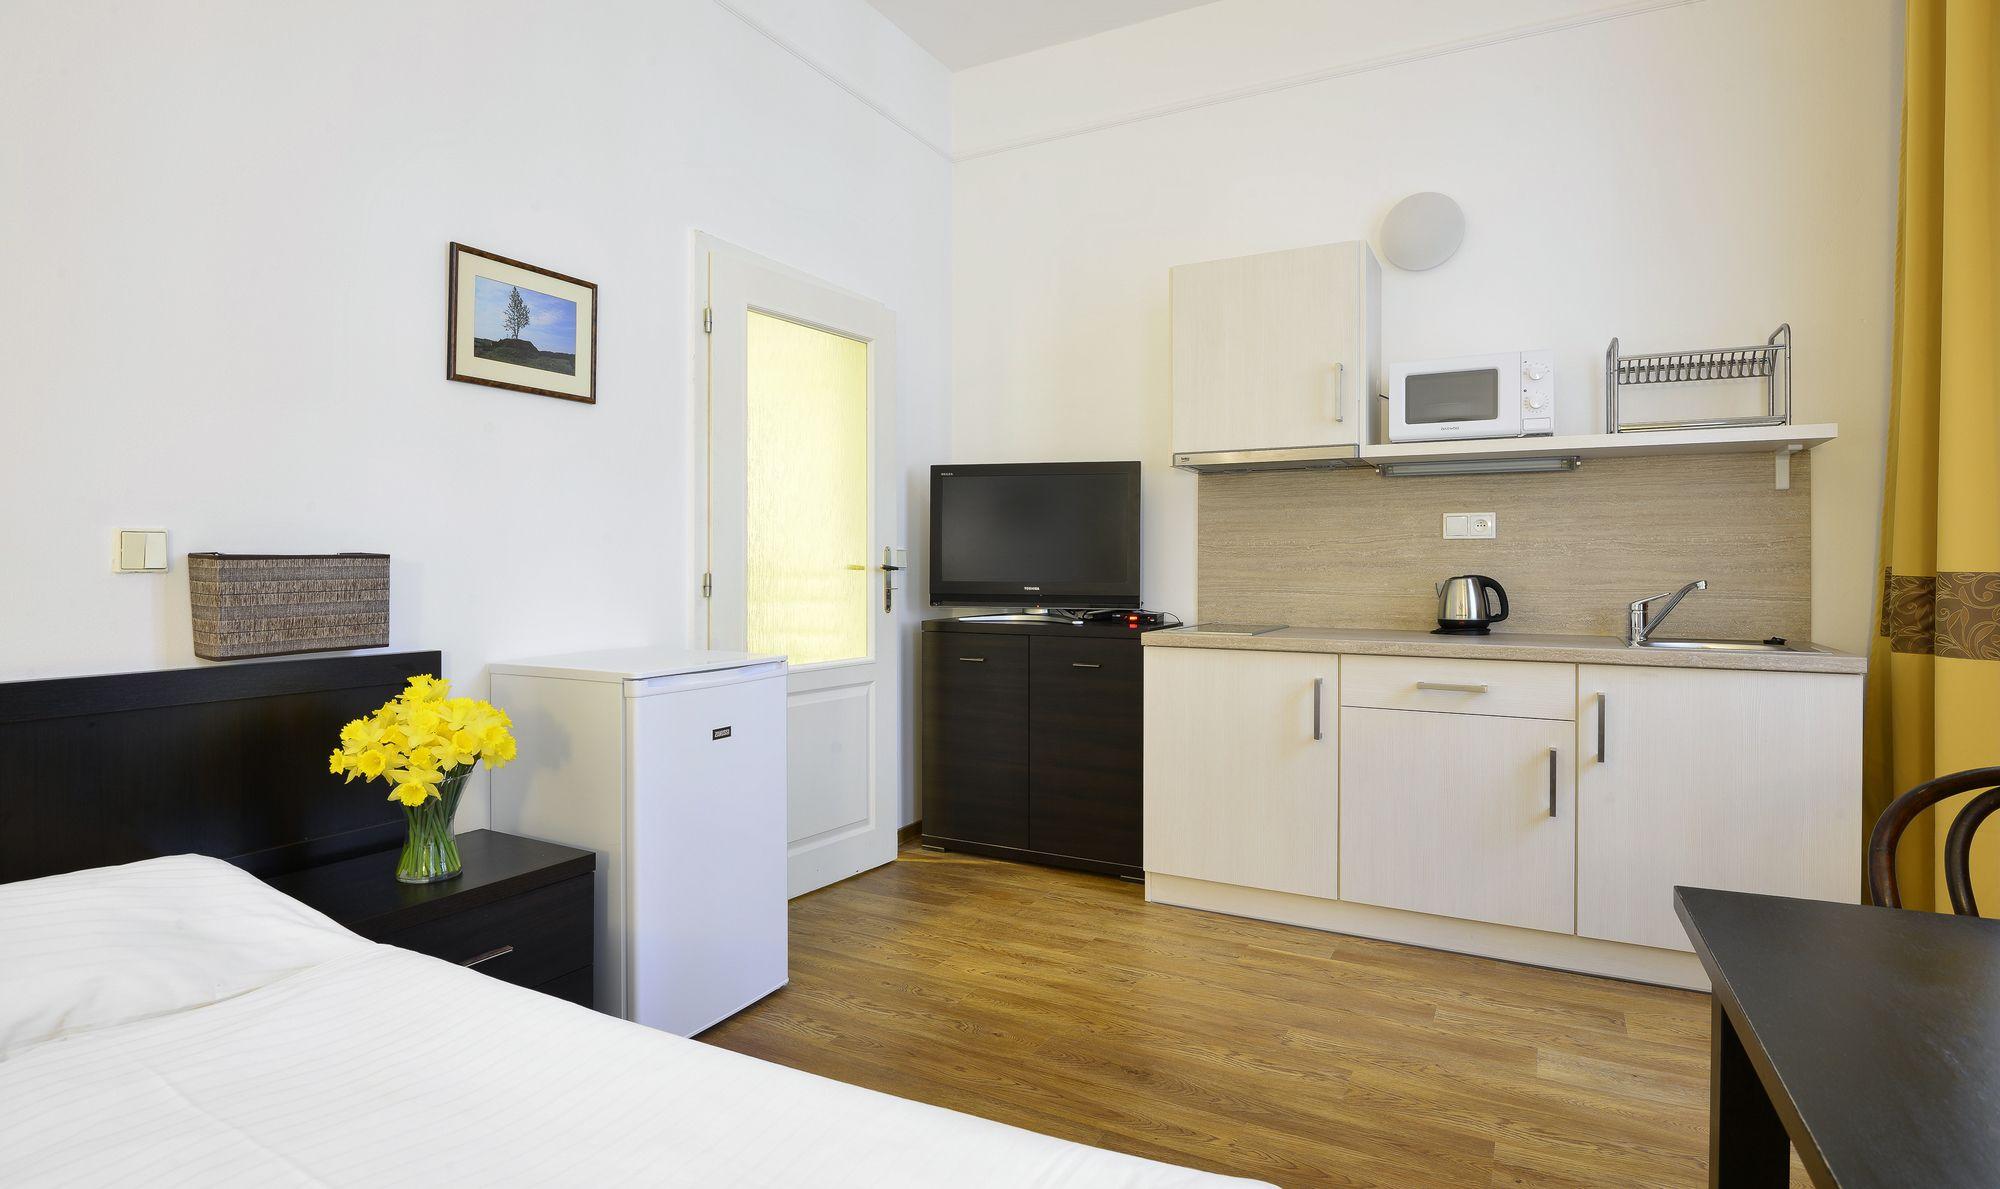 Apartments Marienbad